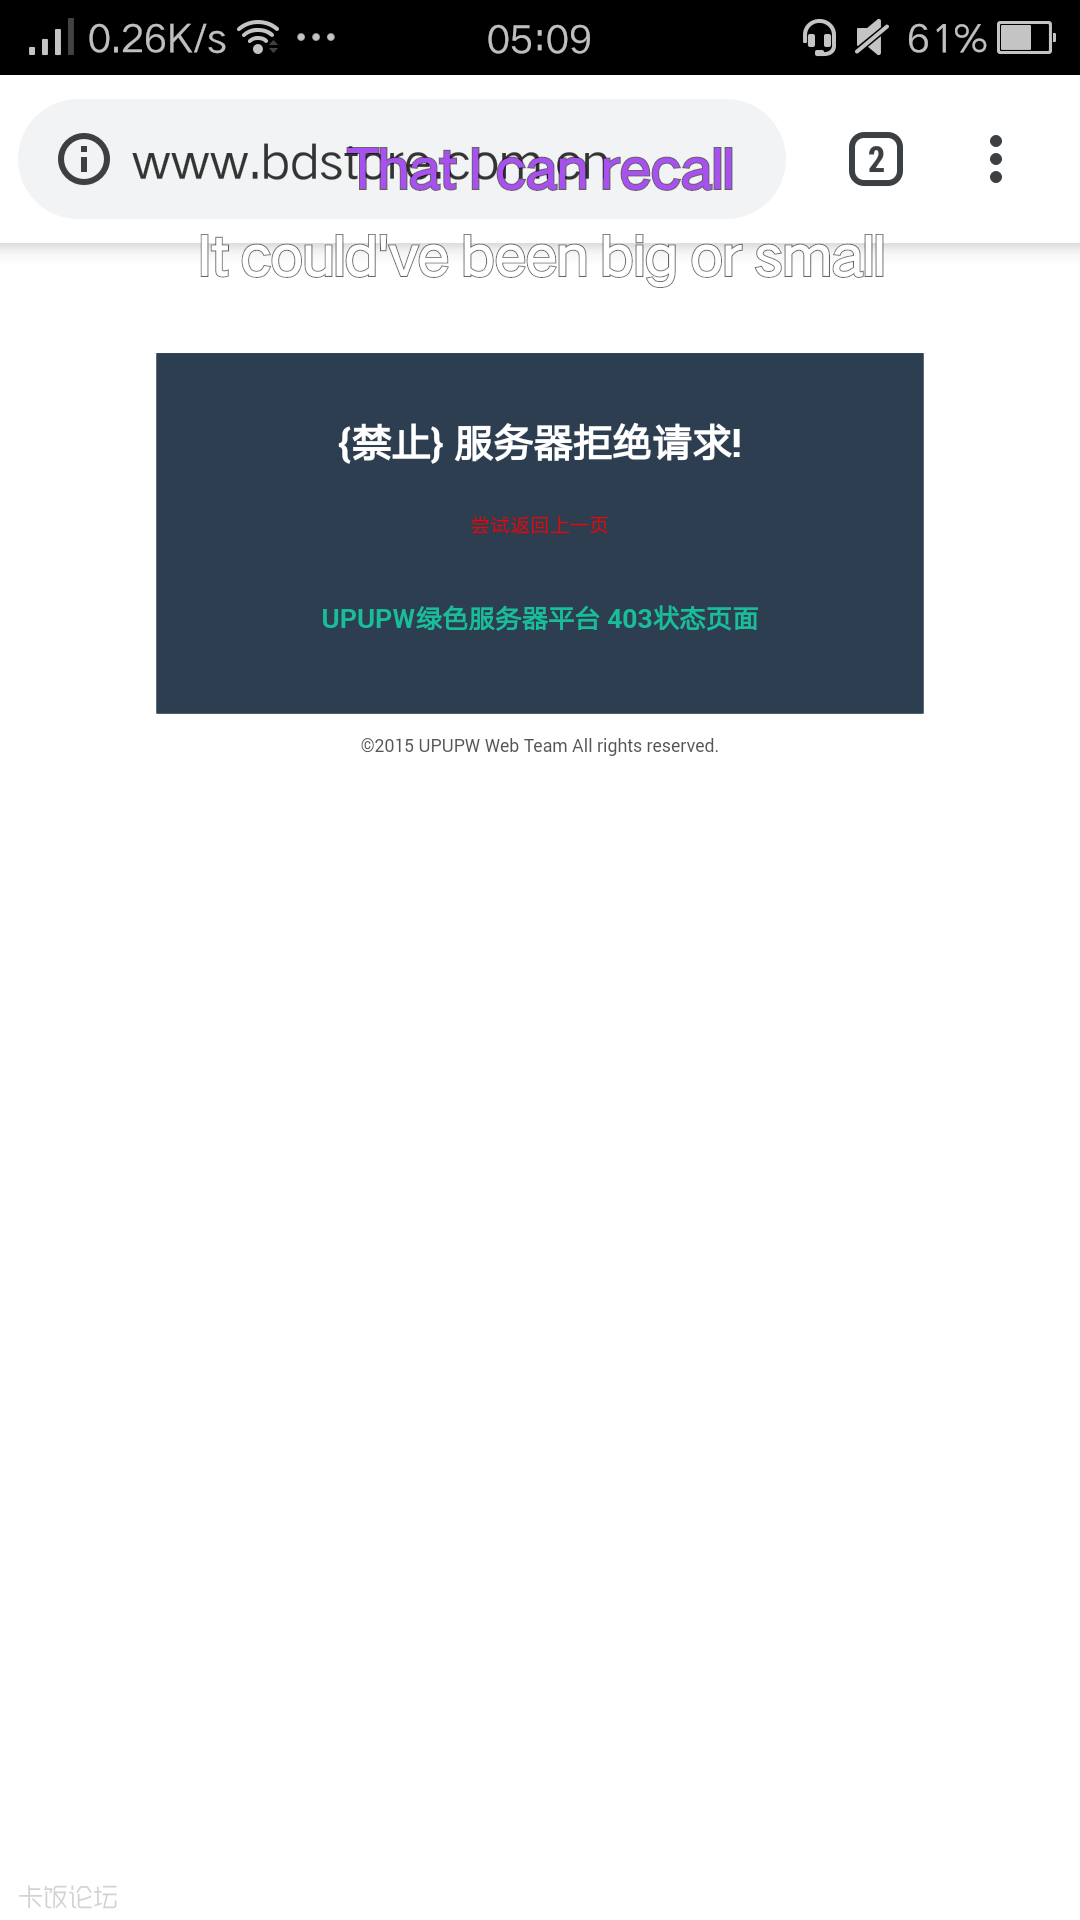 Screenshot_2018-11-04-05-09-12-521.png